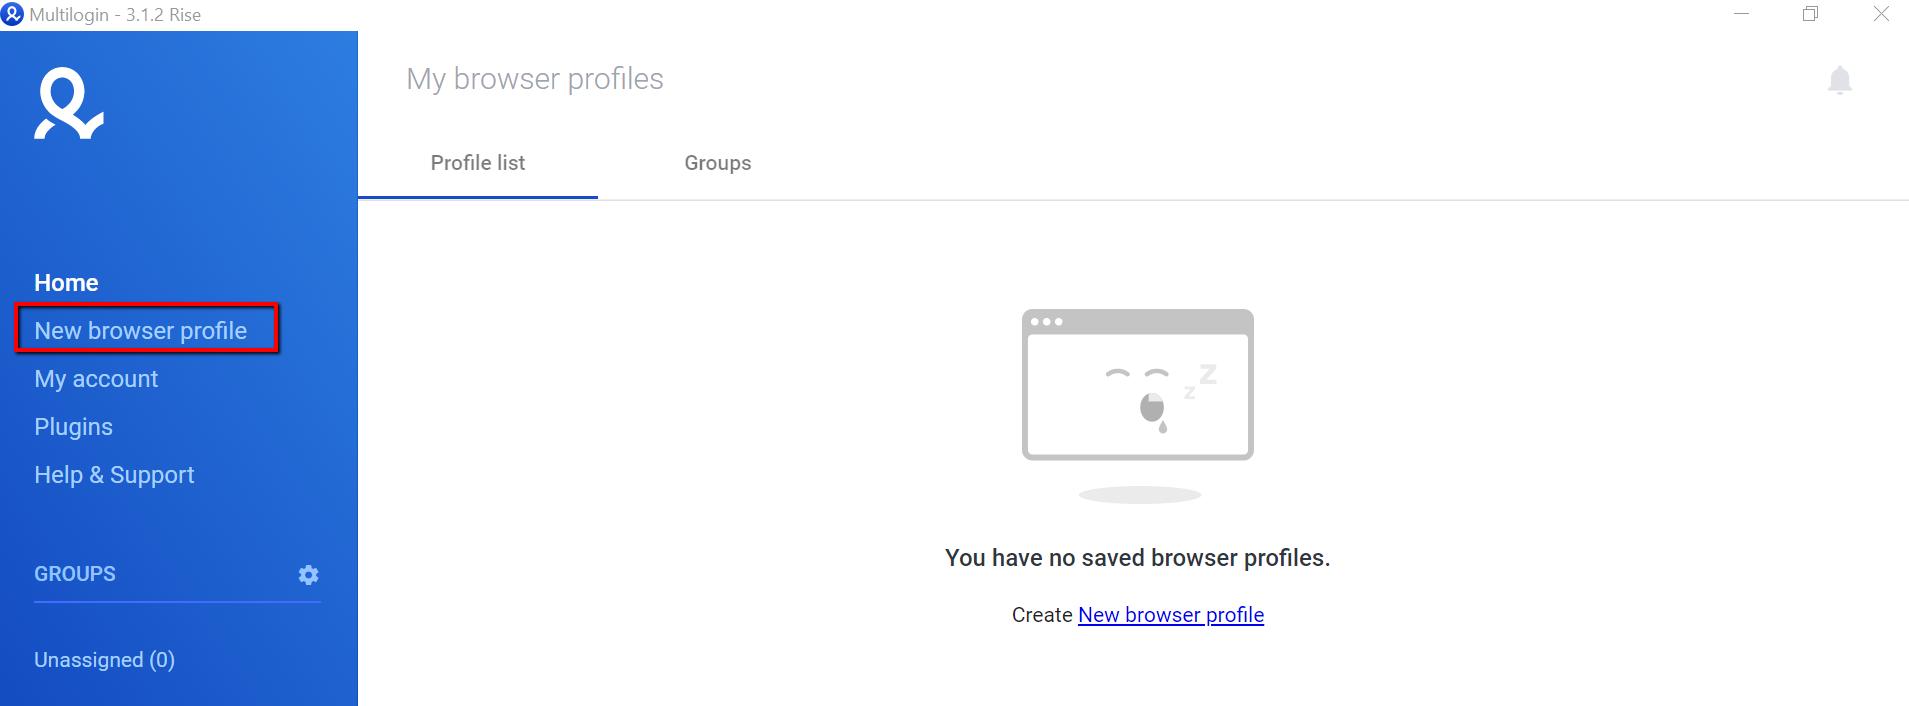 Multilogin app new browser profile